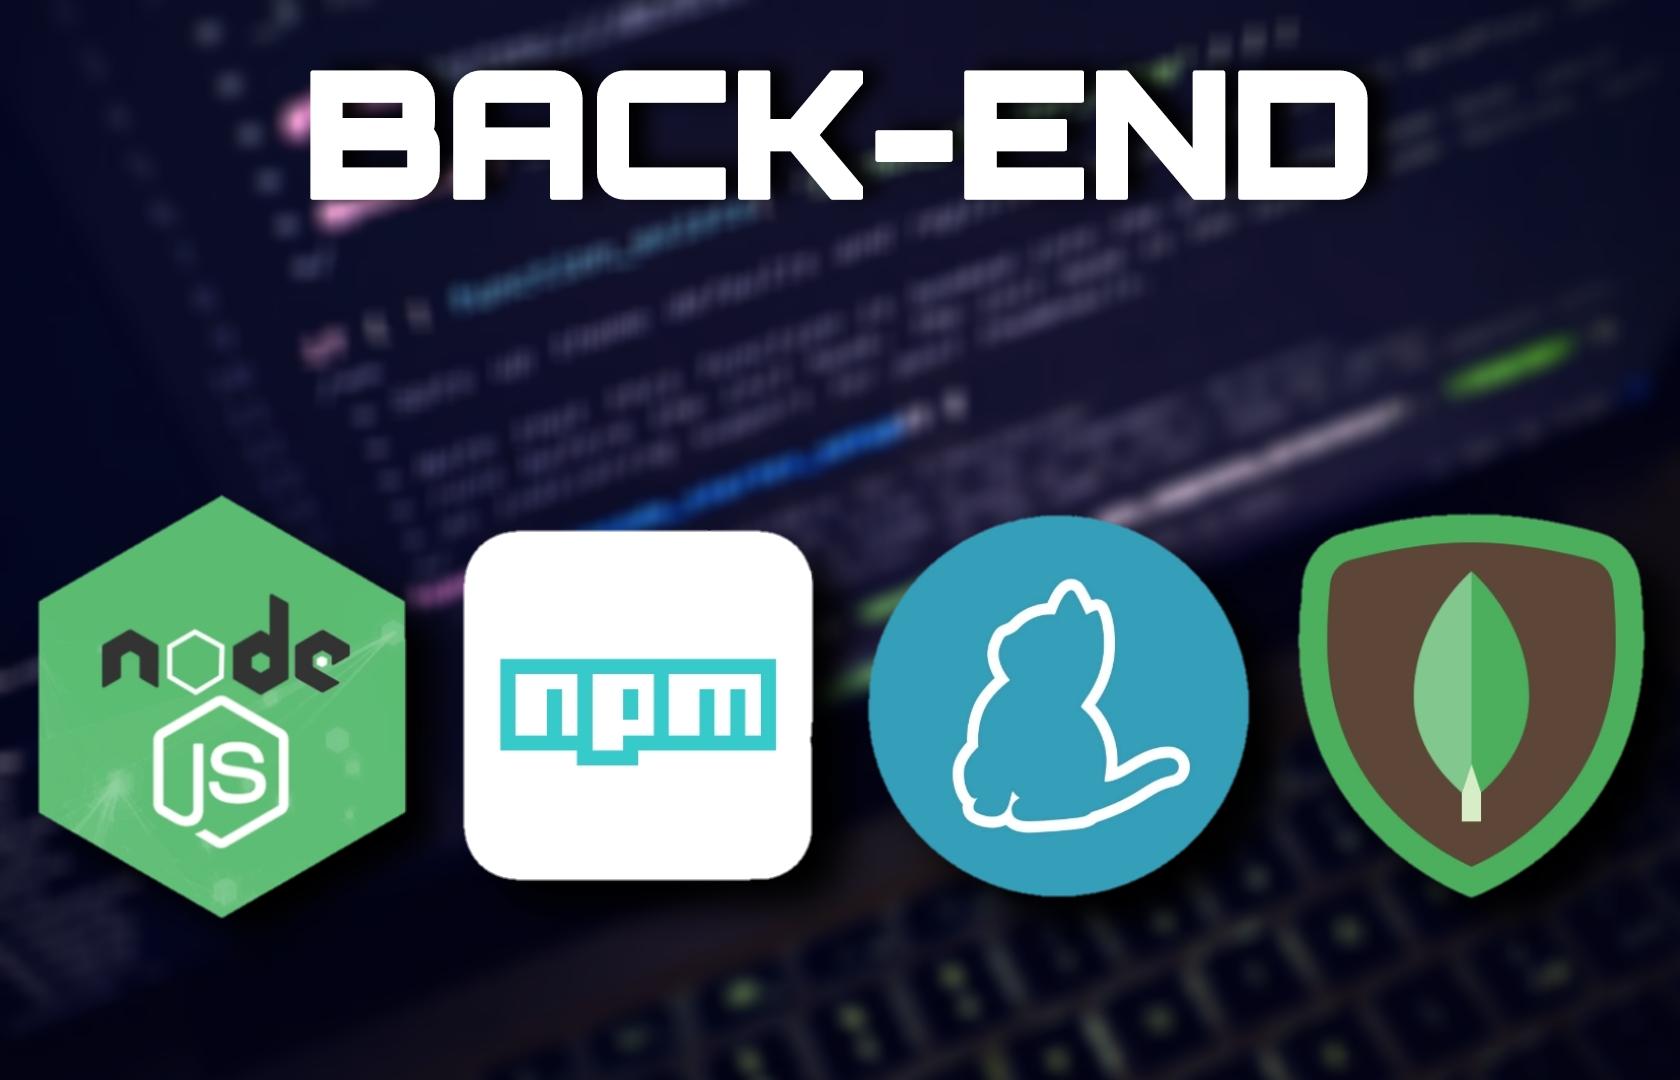 Desenvolvimento Back-End com Node.js, npm, Yarn e MongoDB